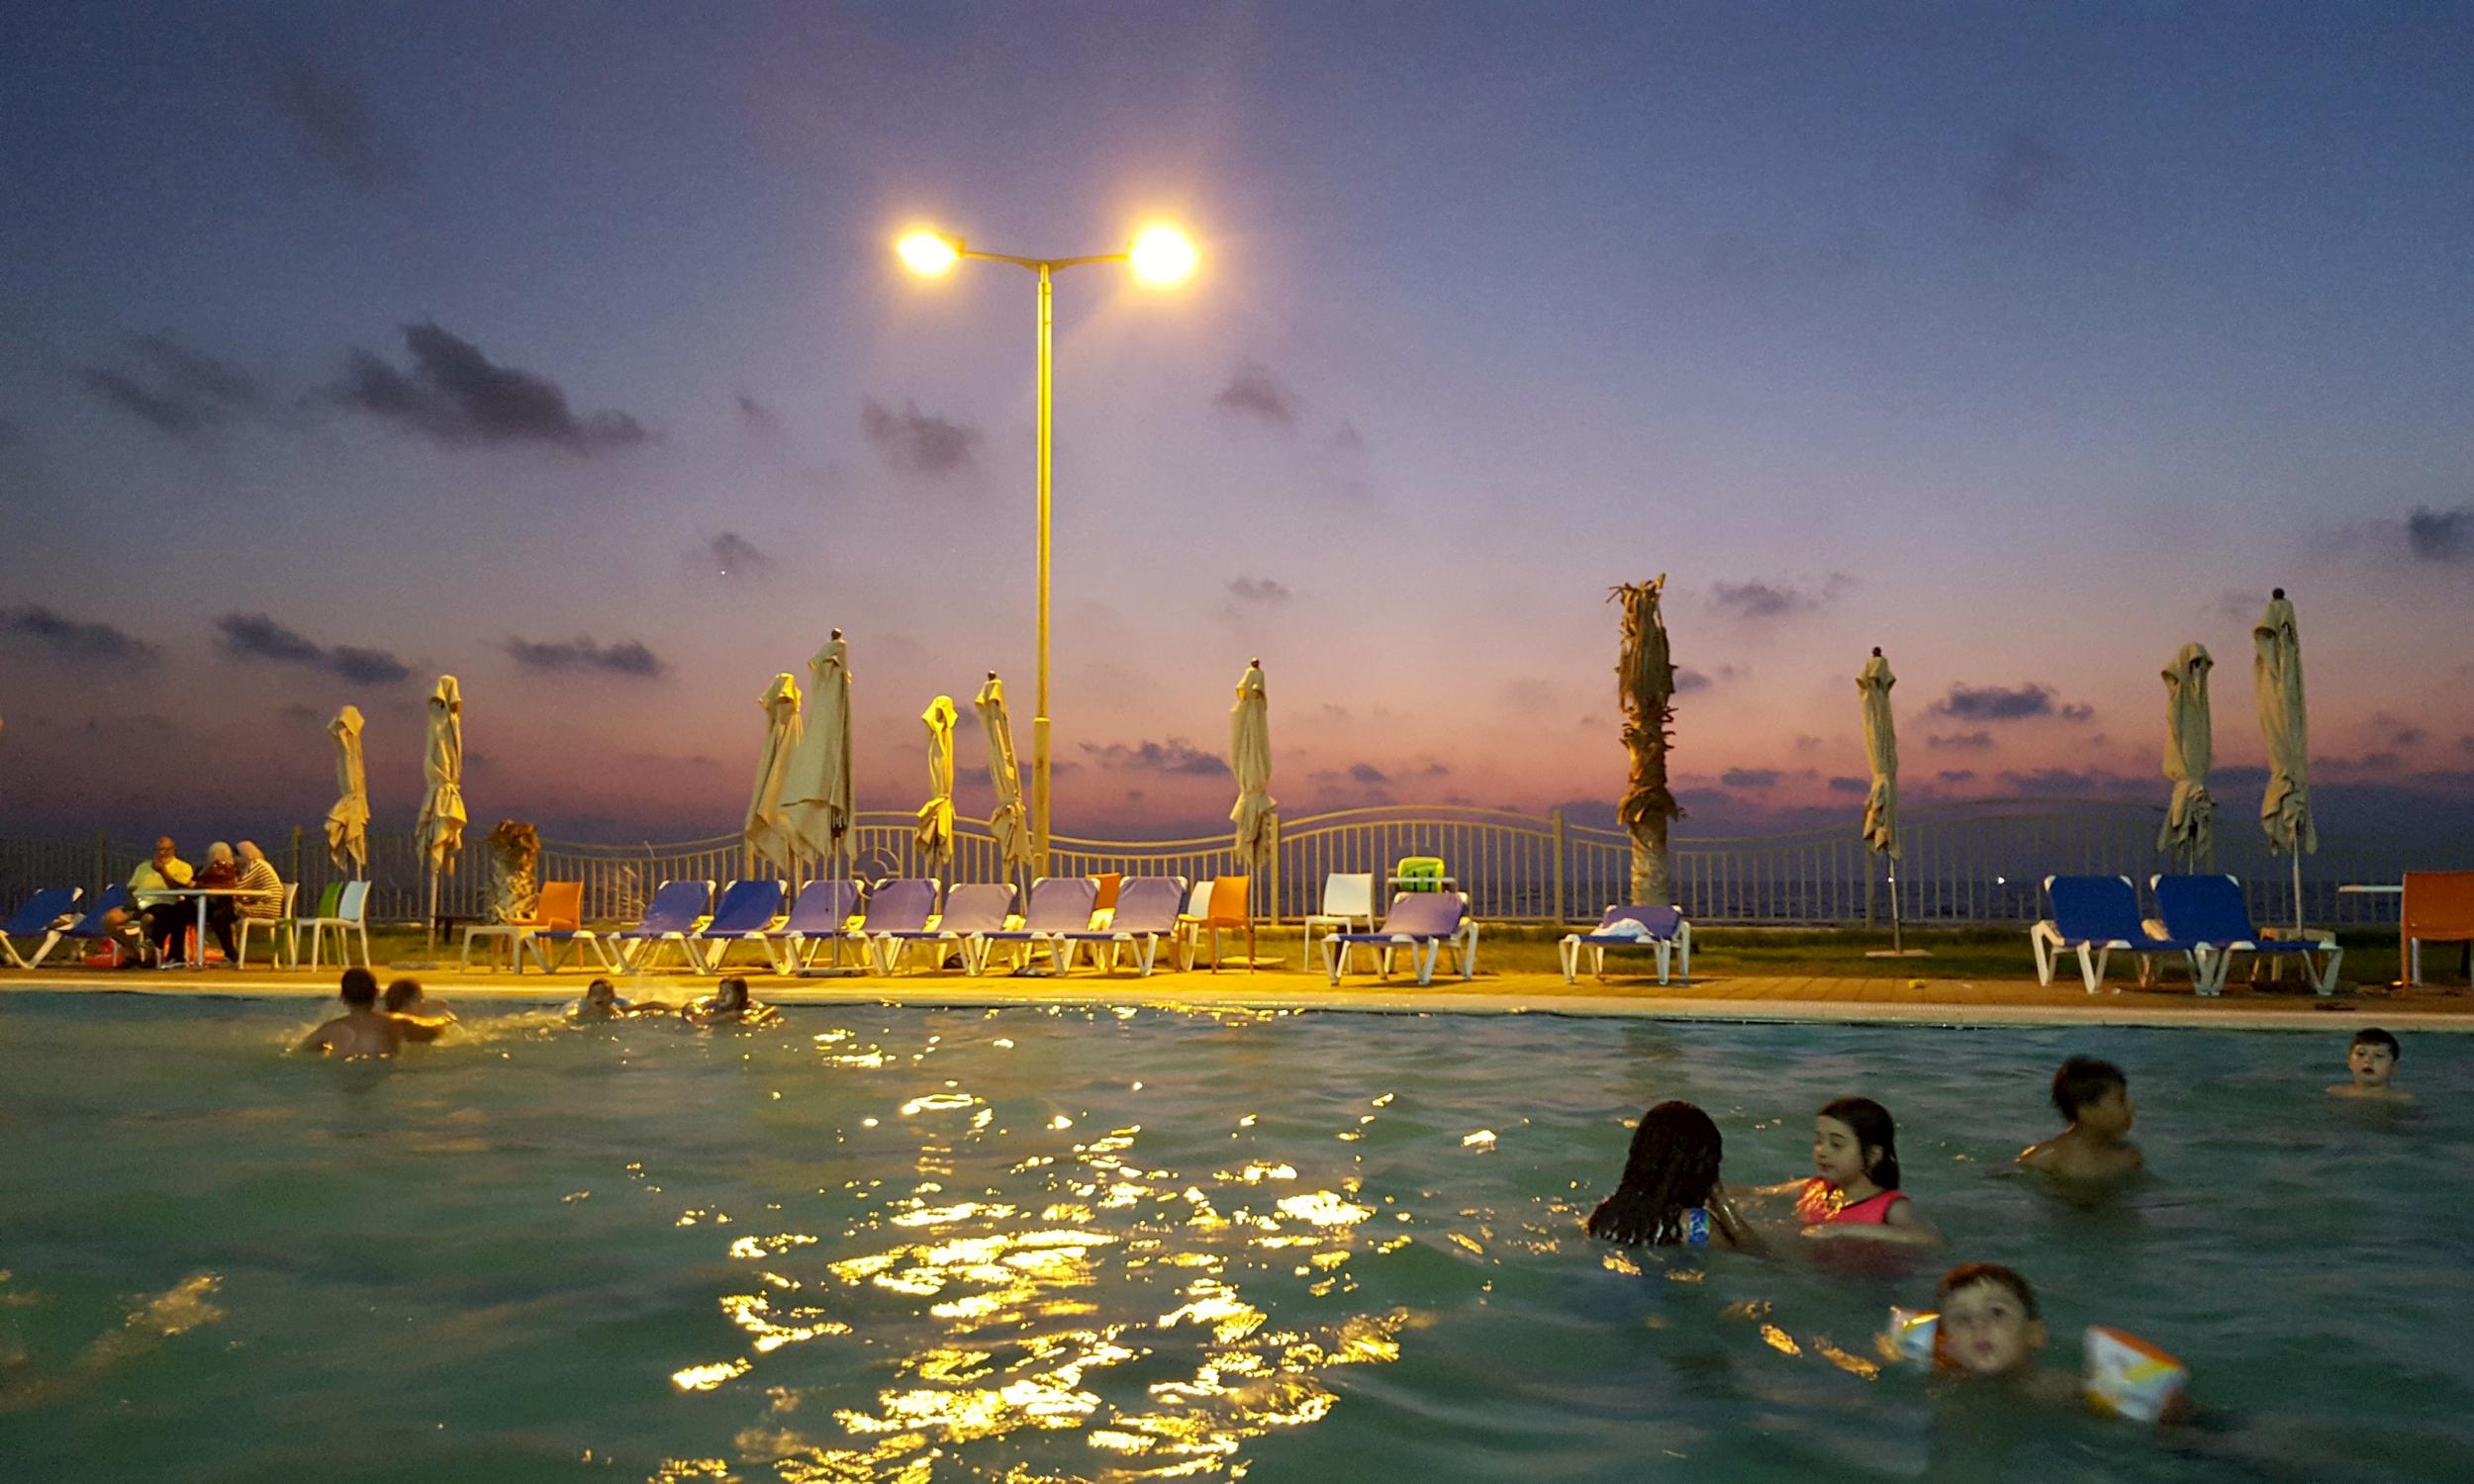 Gaza Resort Offers Oasis in War-Torn Land